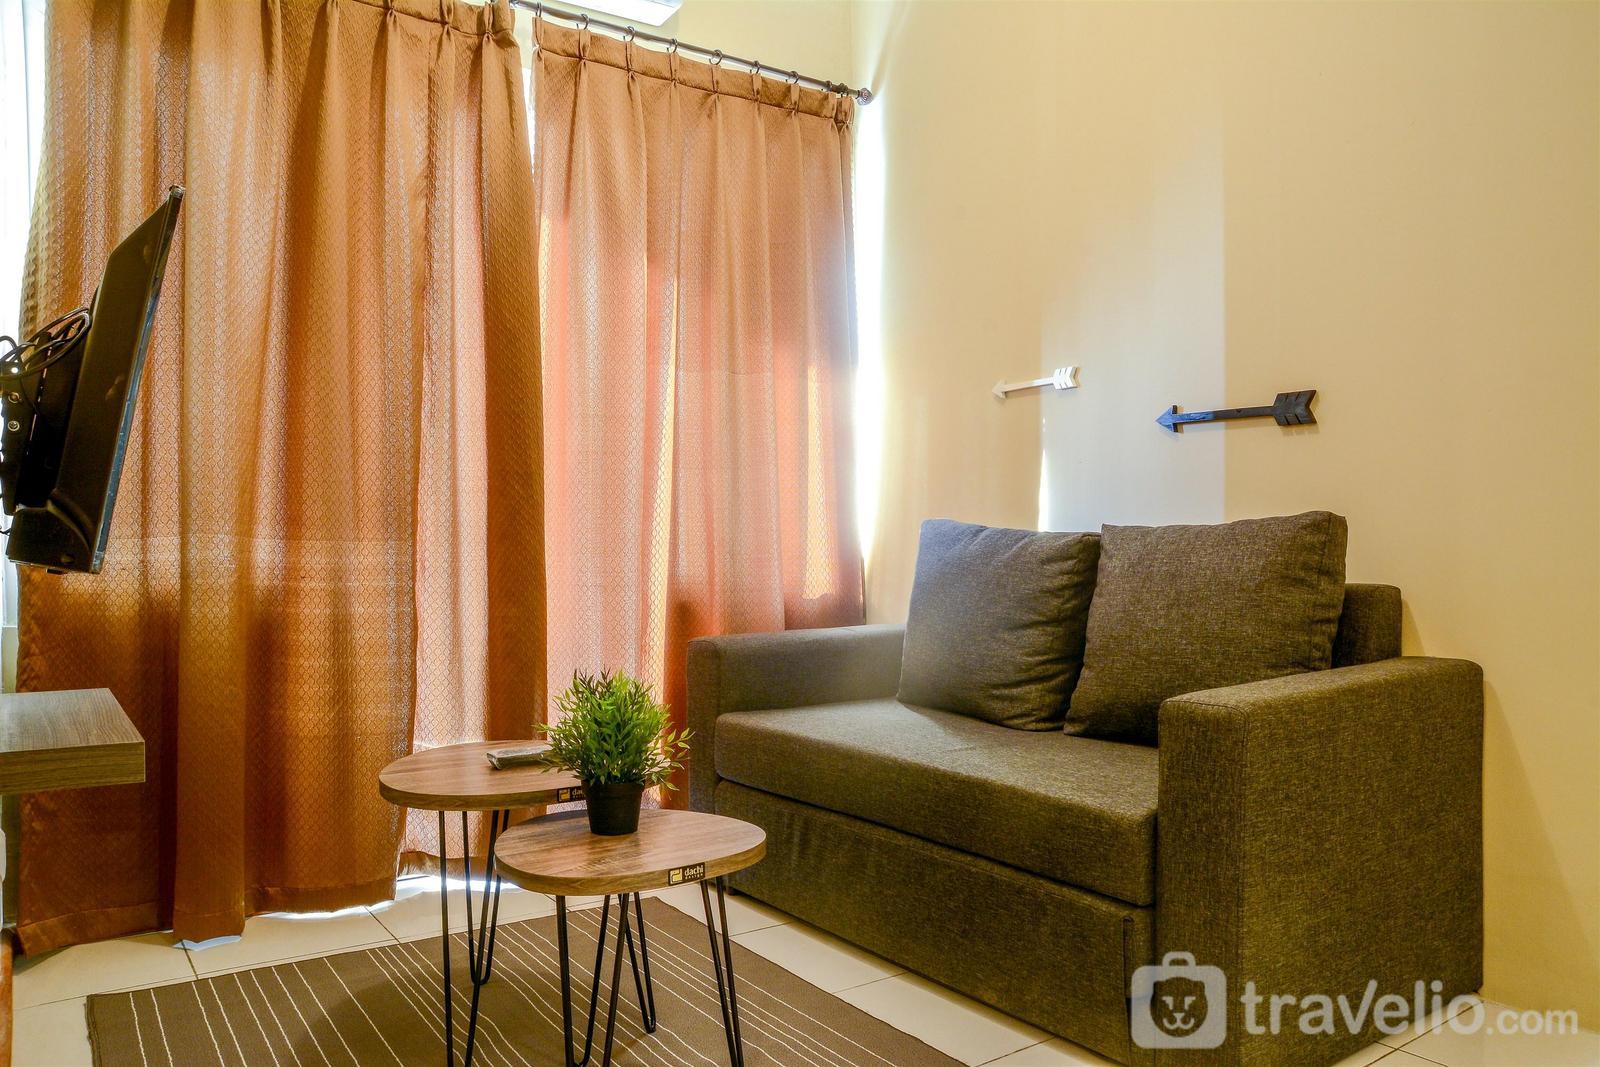 Apartemen Grand Palace Kemayoran - Best 3BR Apartment Grand Palace Kemayoran with Sofabed By Travelio